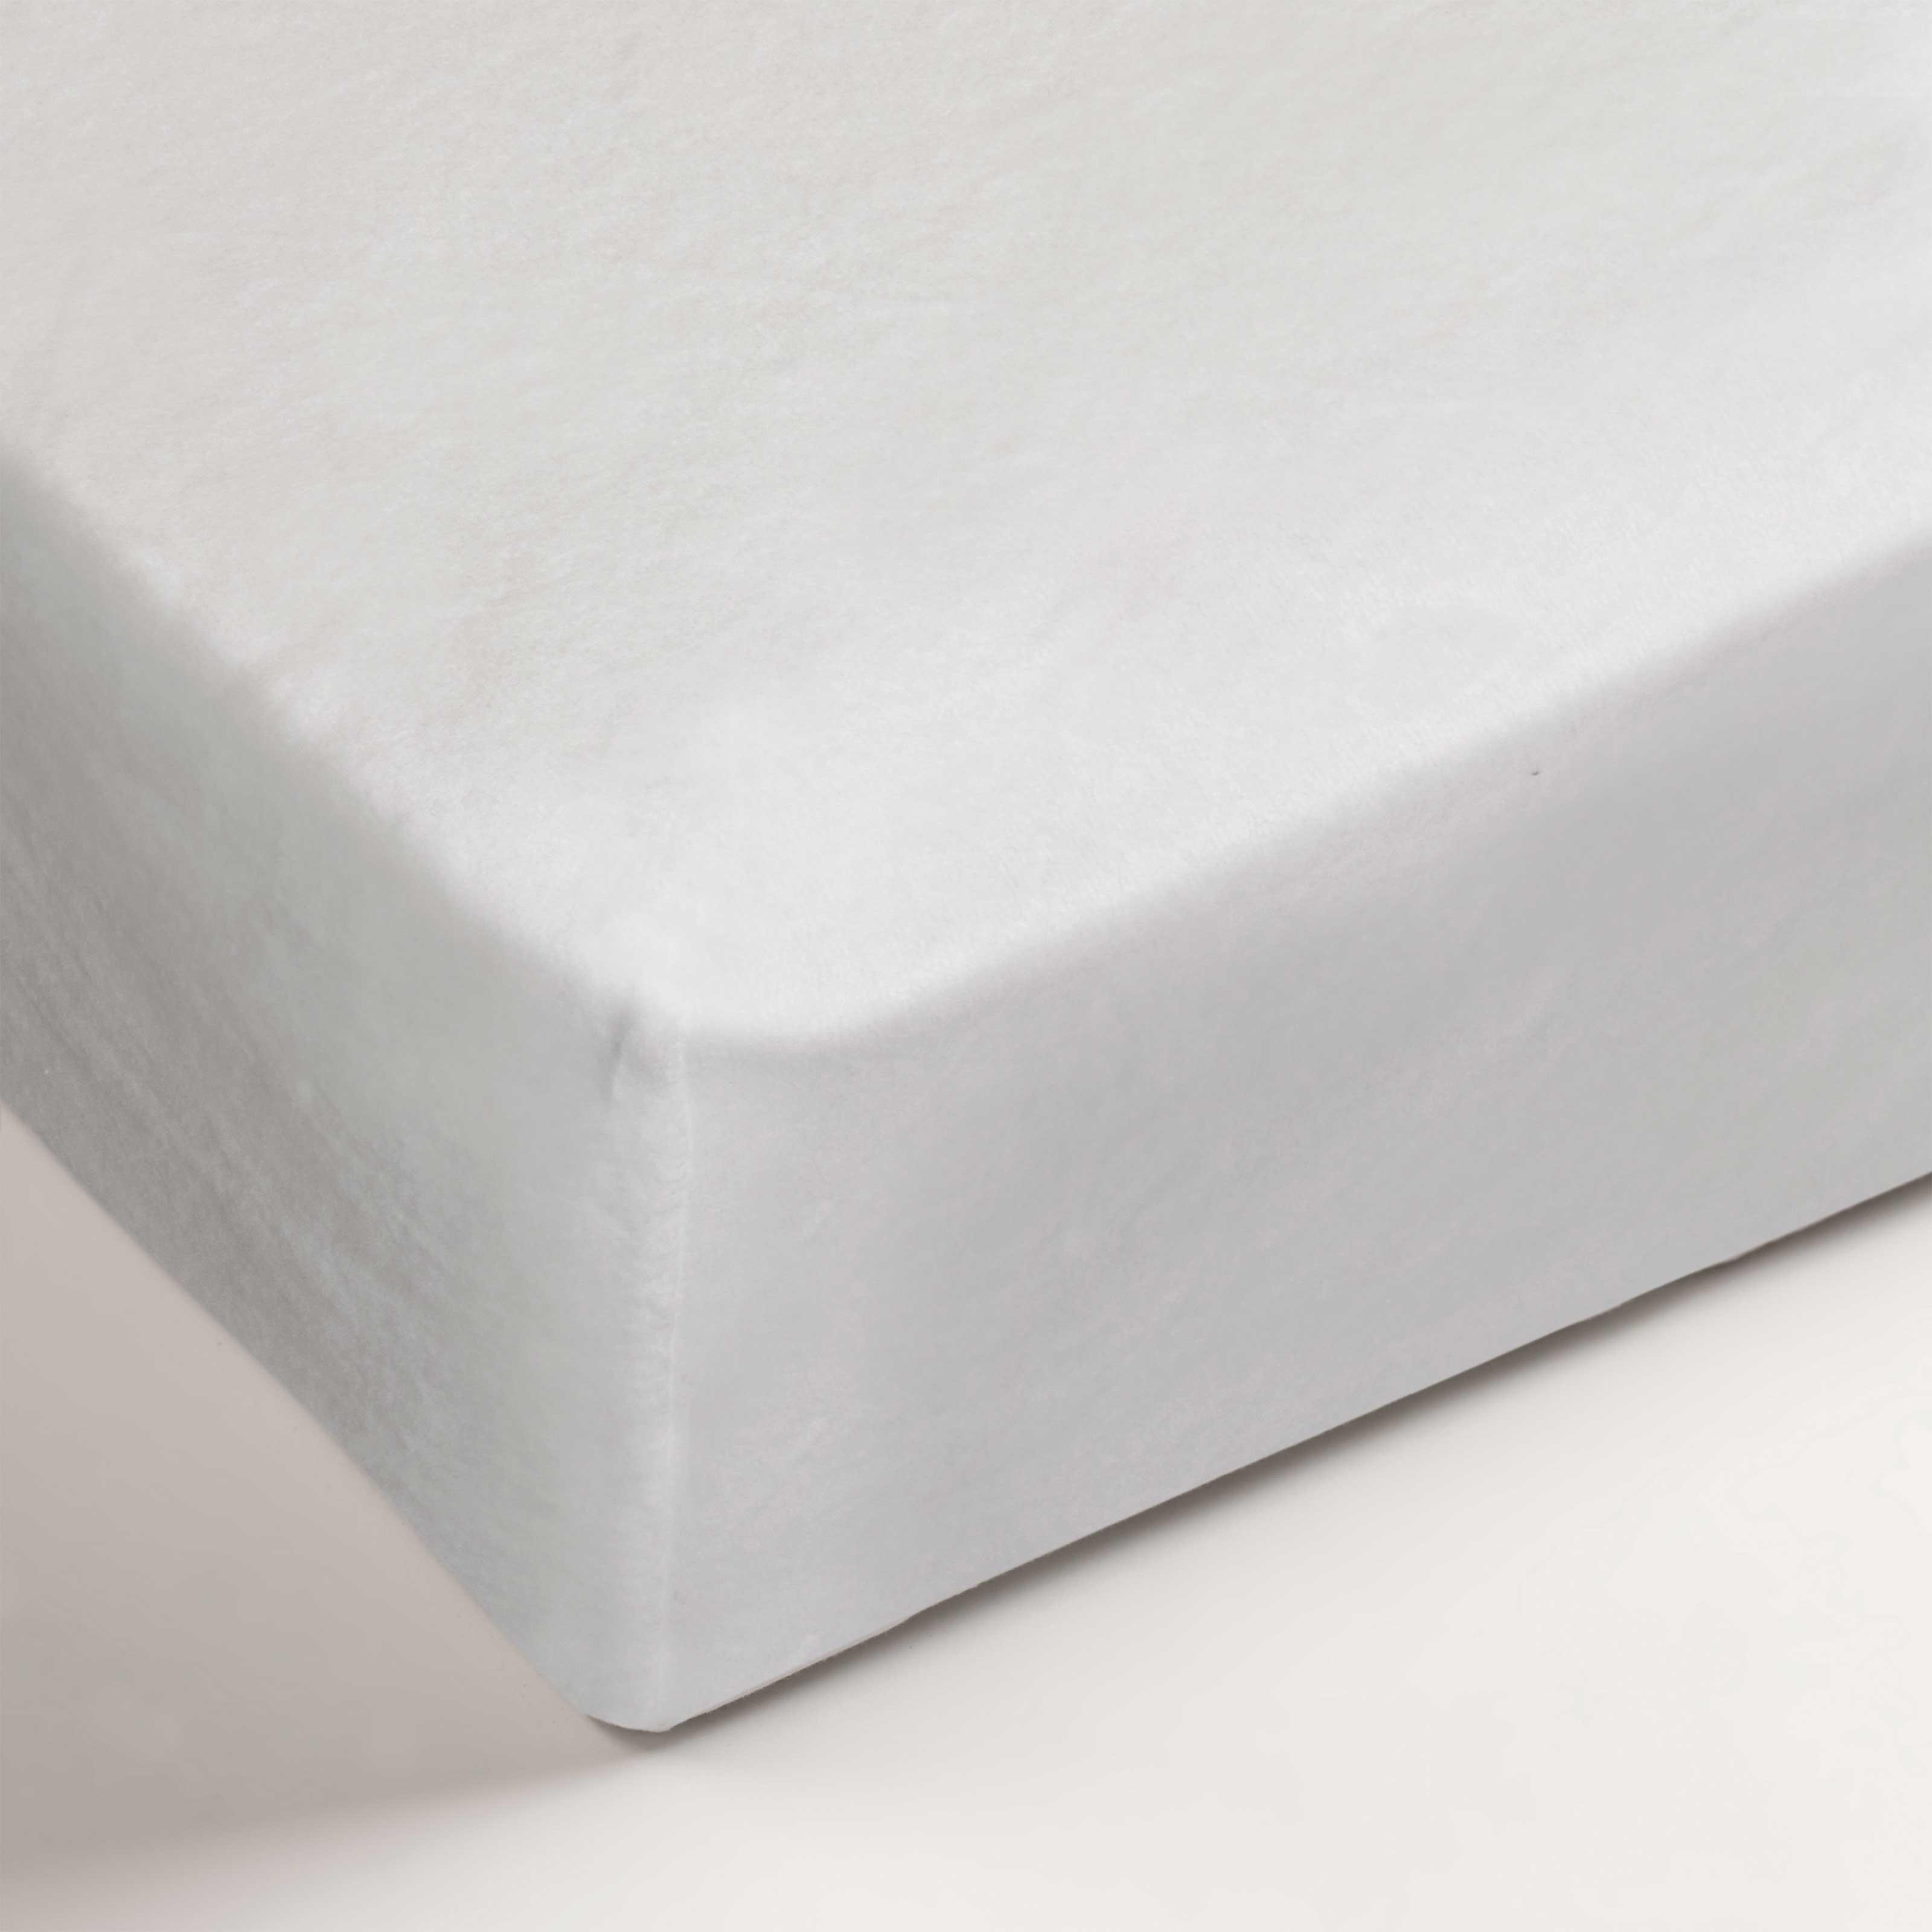 BH molton faconlagen 140/160x200/220x28 hvid thumbnail